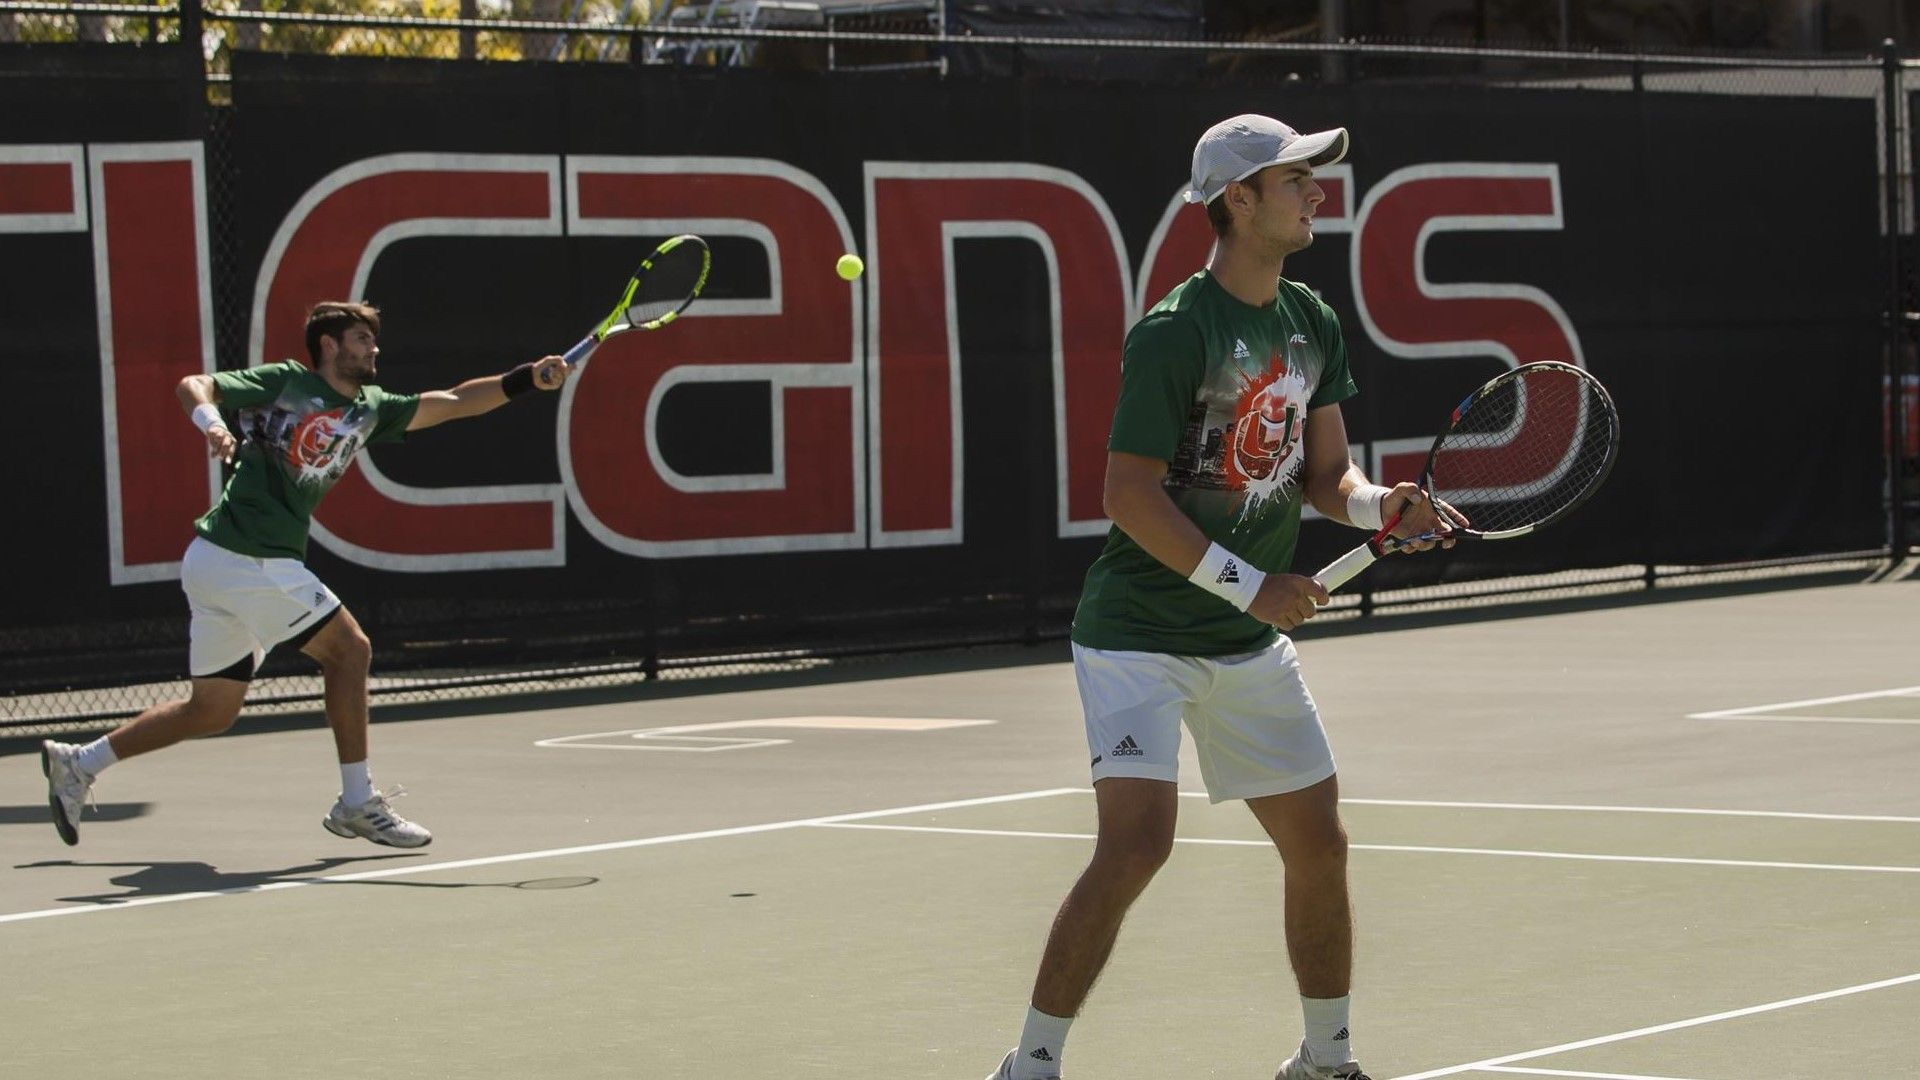 Men's Tennis Downs No. 38 Louisville to Extend Streak